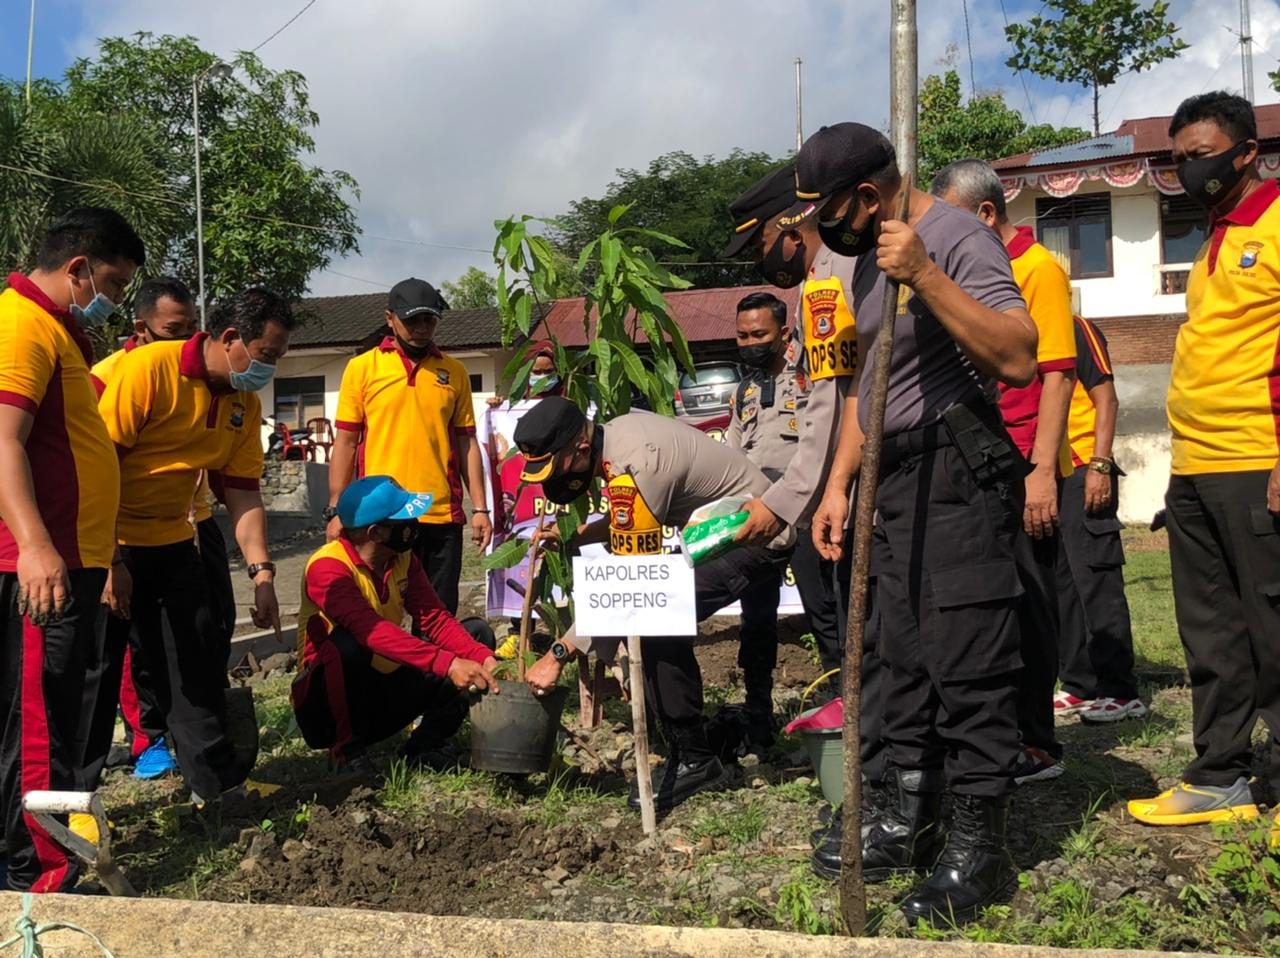 Polres Soppeng Giat Tanam Pohon di Halaman Mako Polres Lalabata